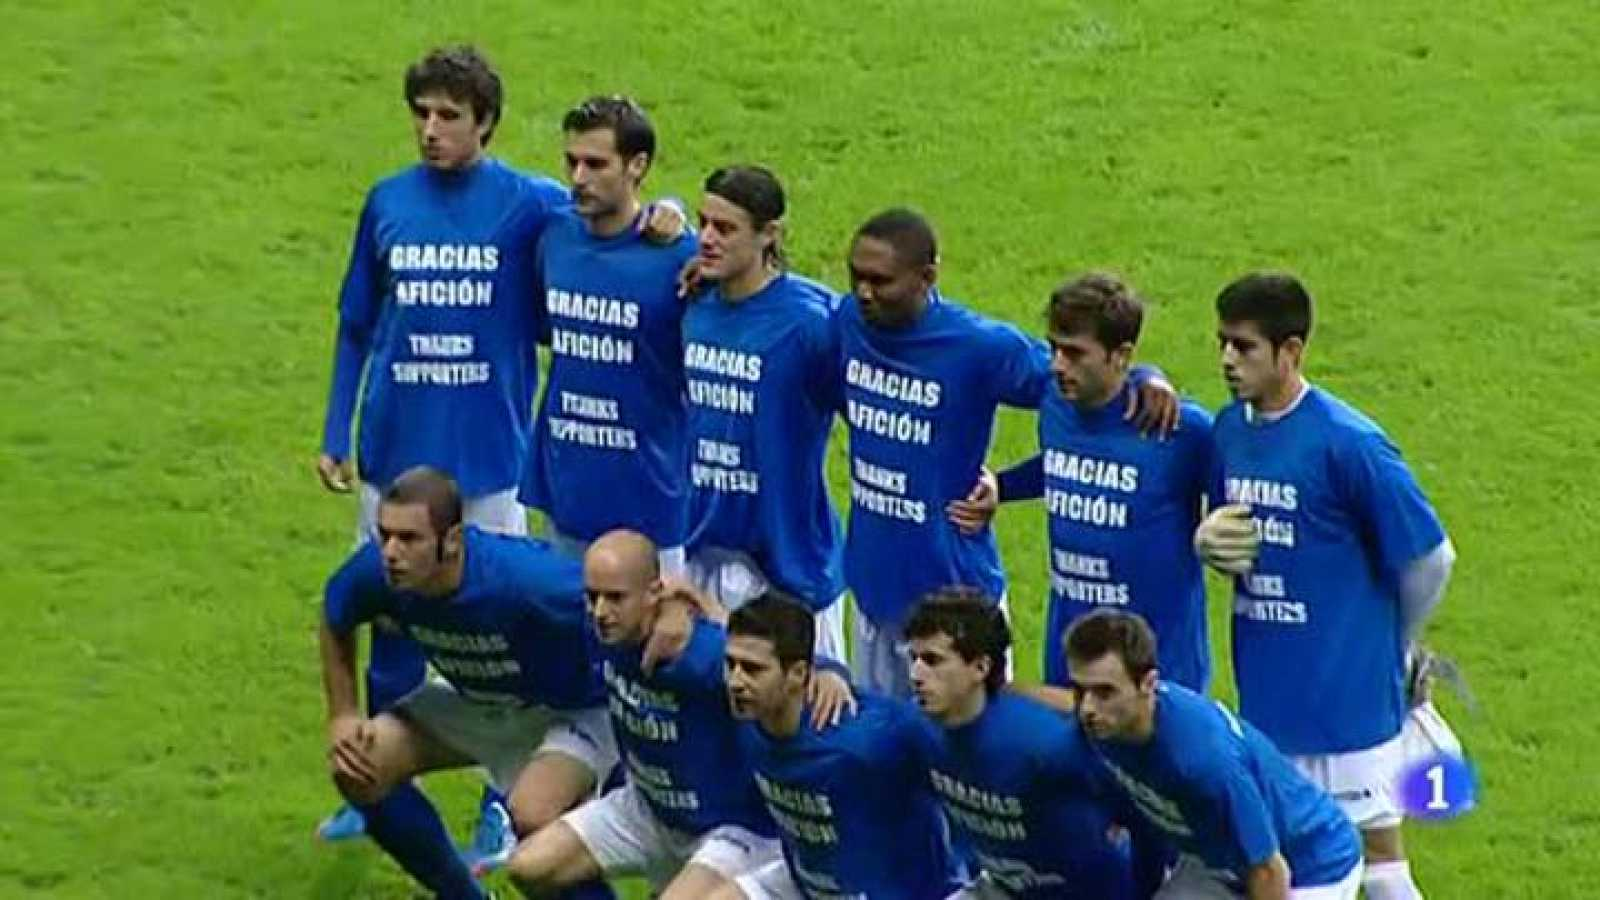 La esperanza vuelve al Oviedo